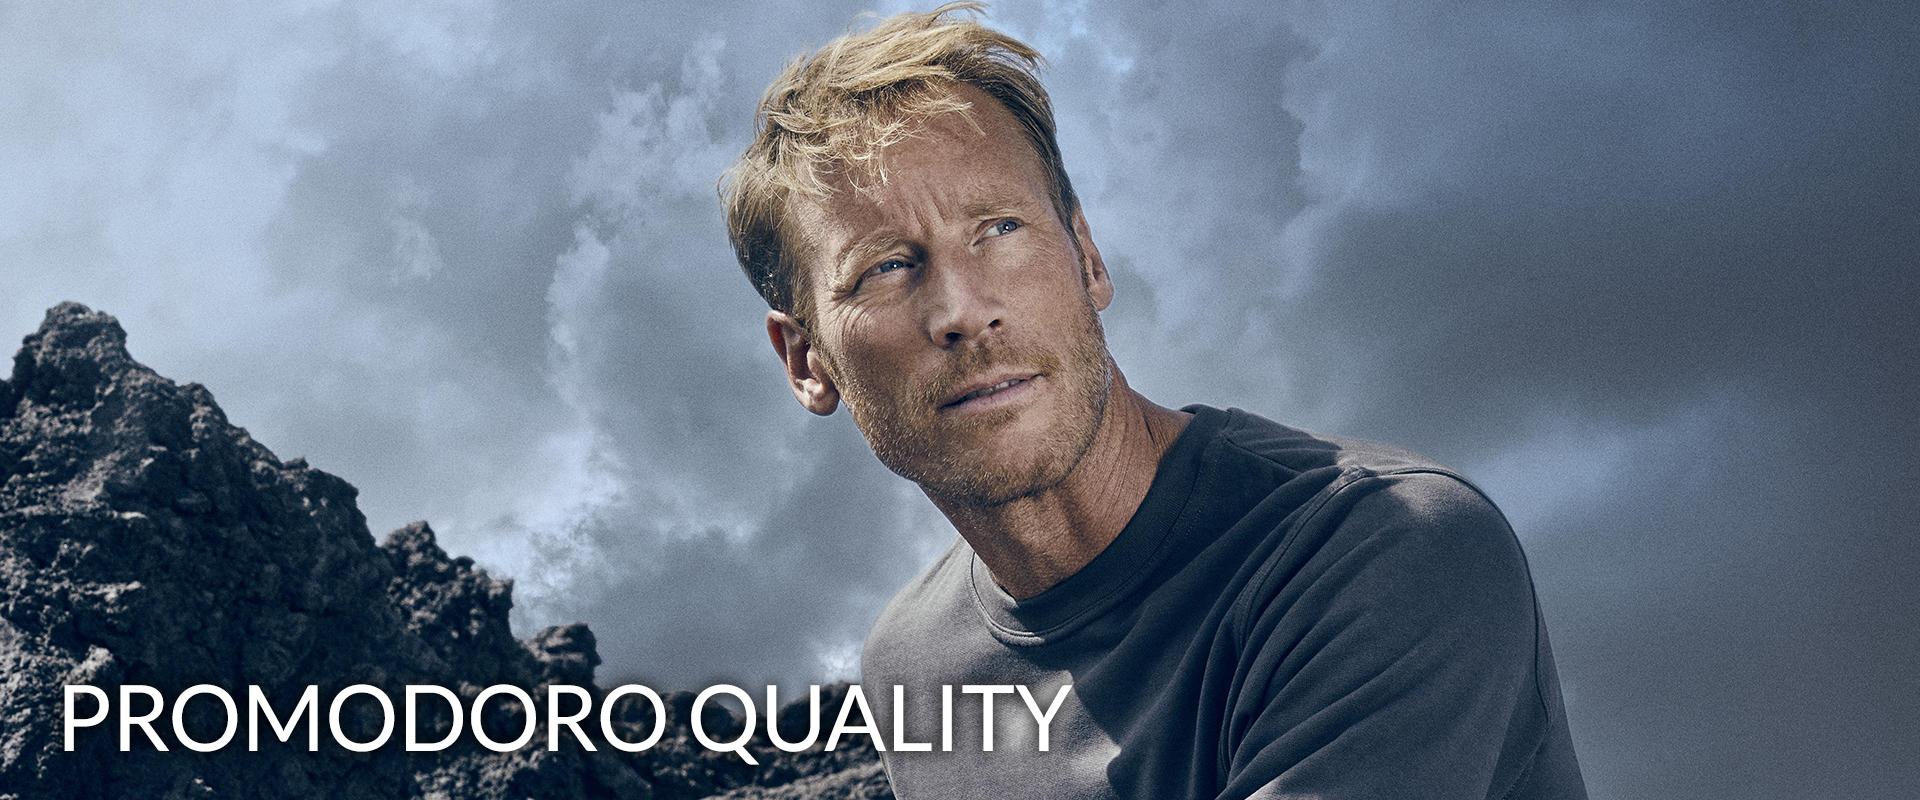 Promodoro Quality